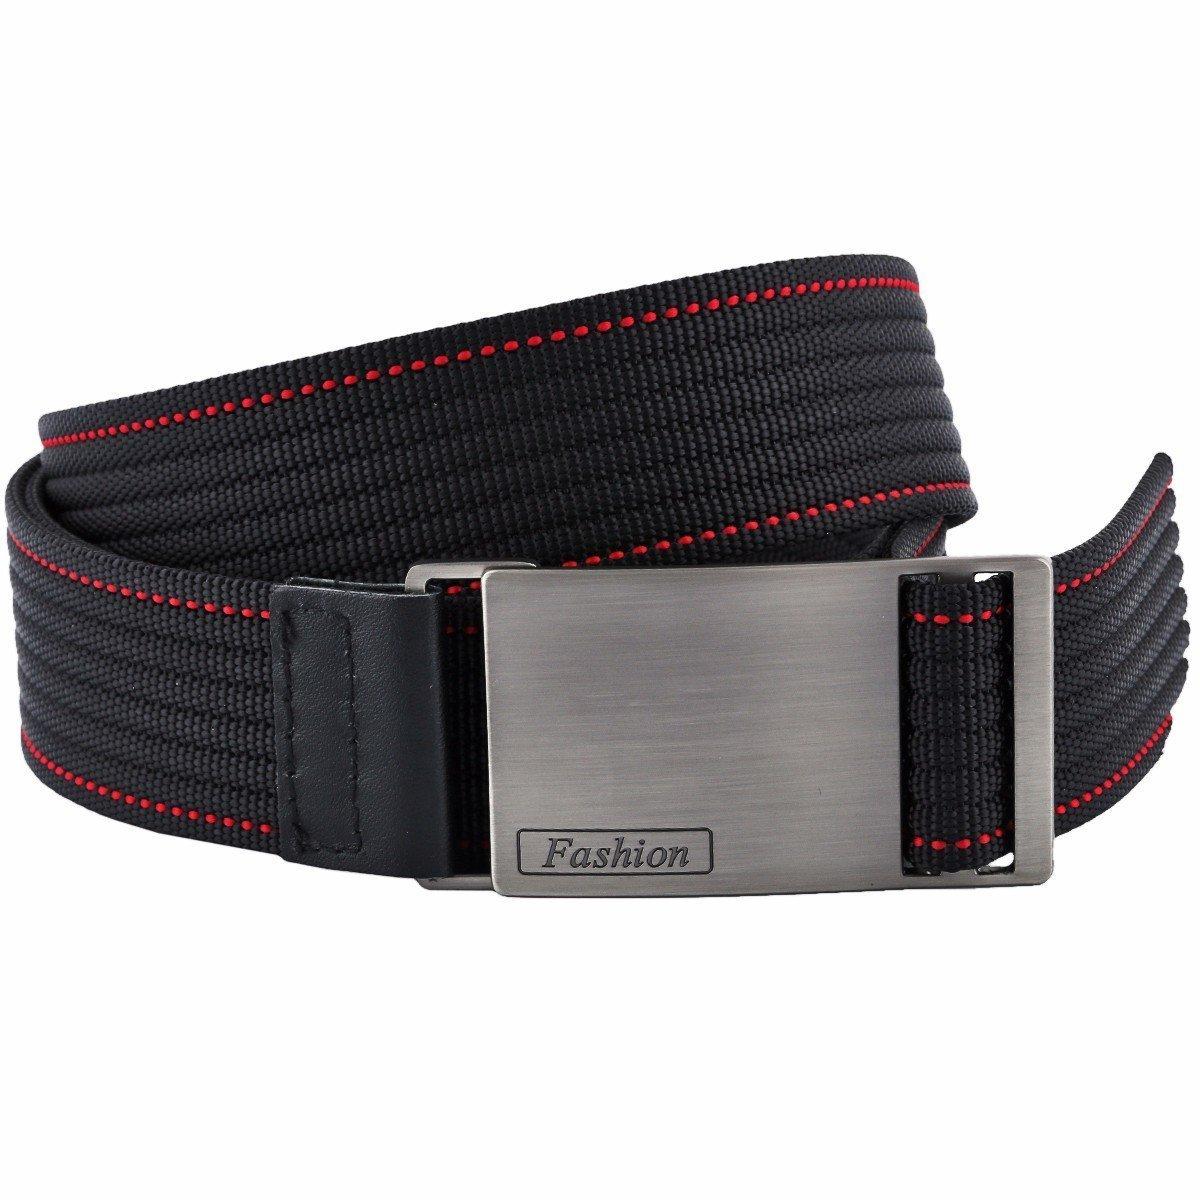 squaregarden Men's Nylon Webbing Belt Military Style Tactical Duty Belts for Men